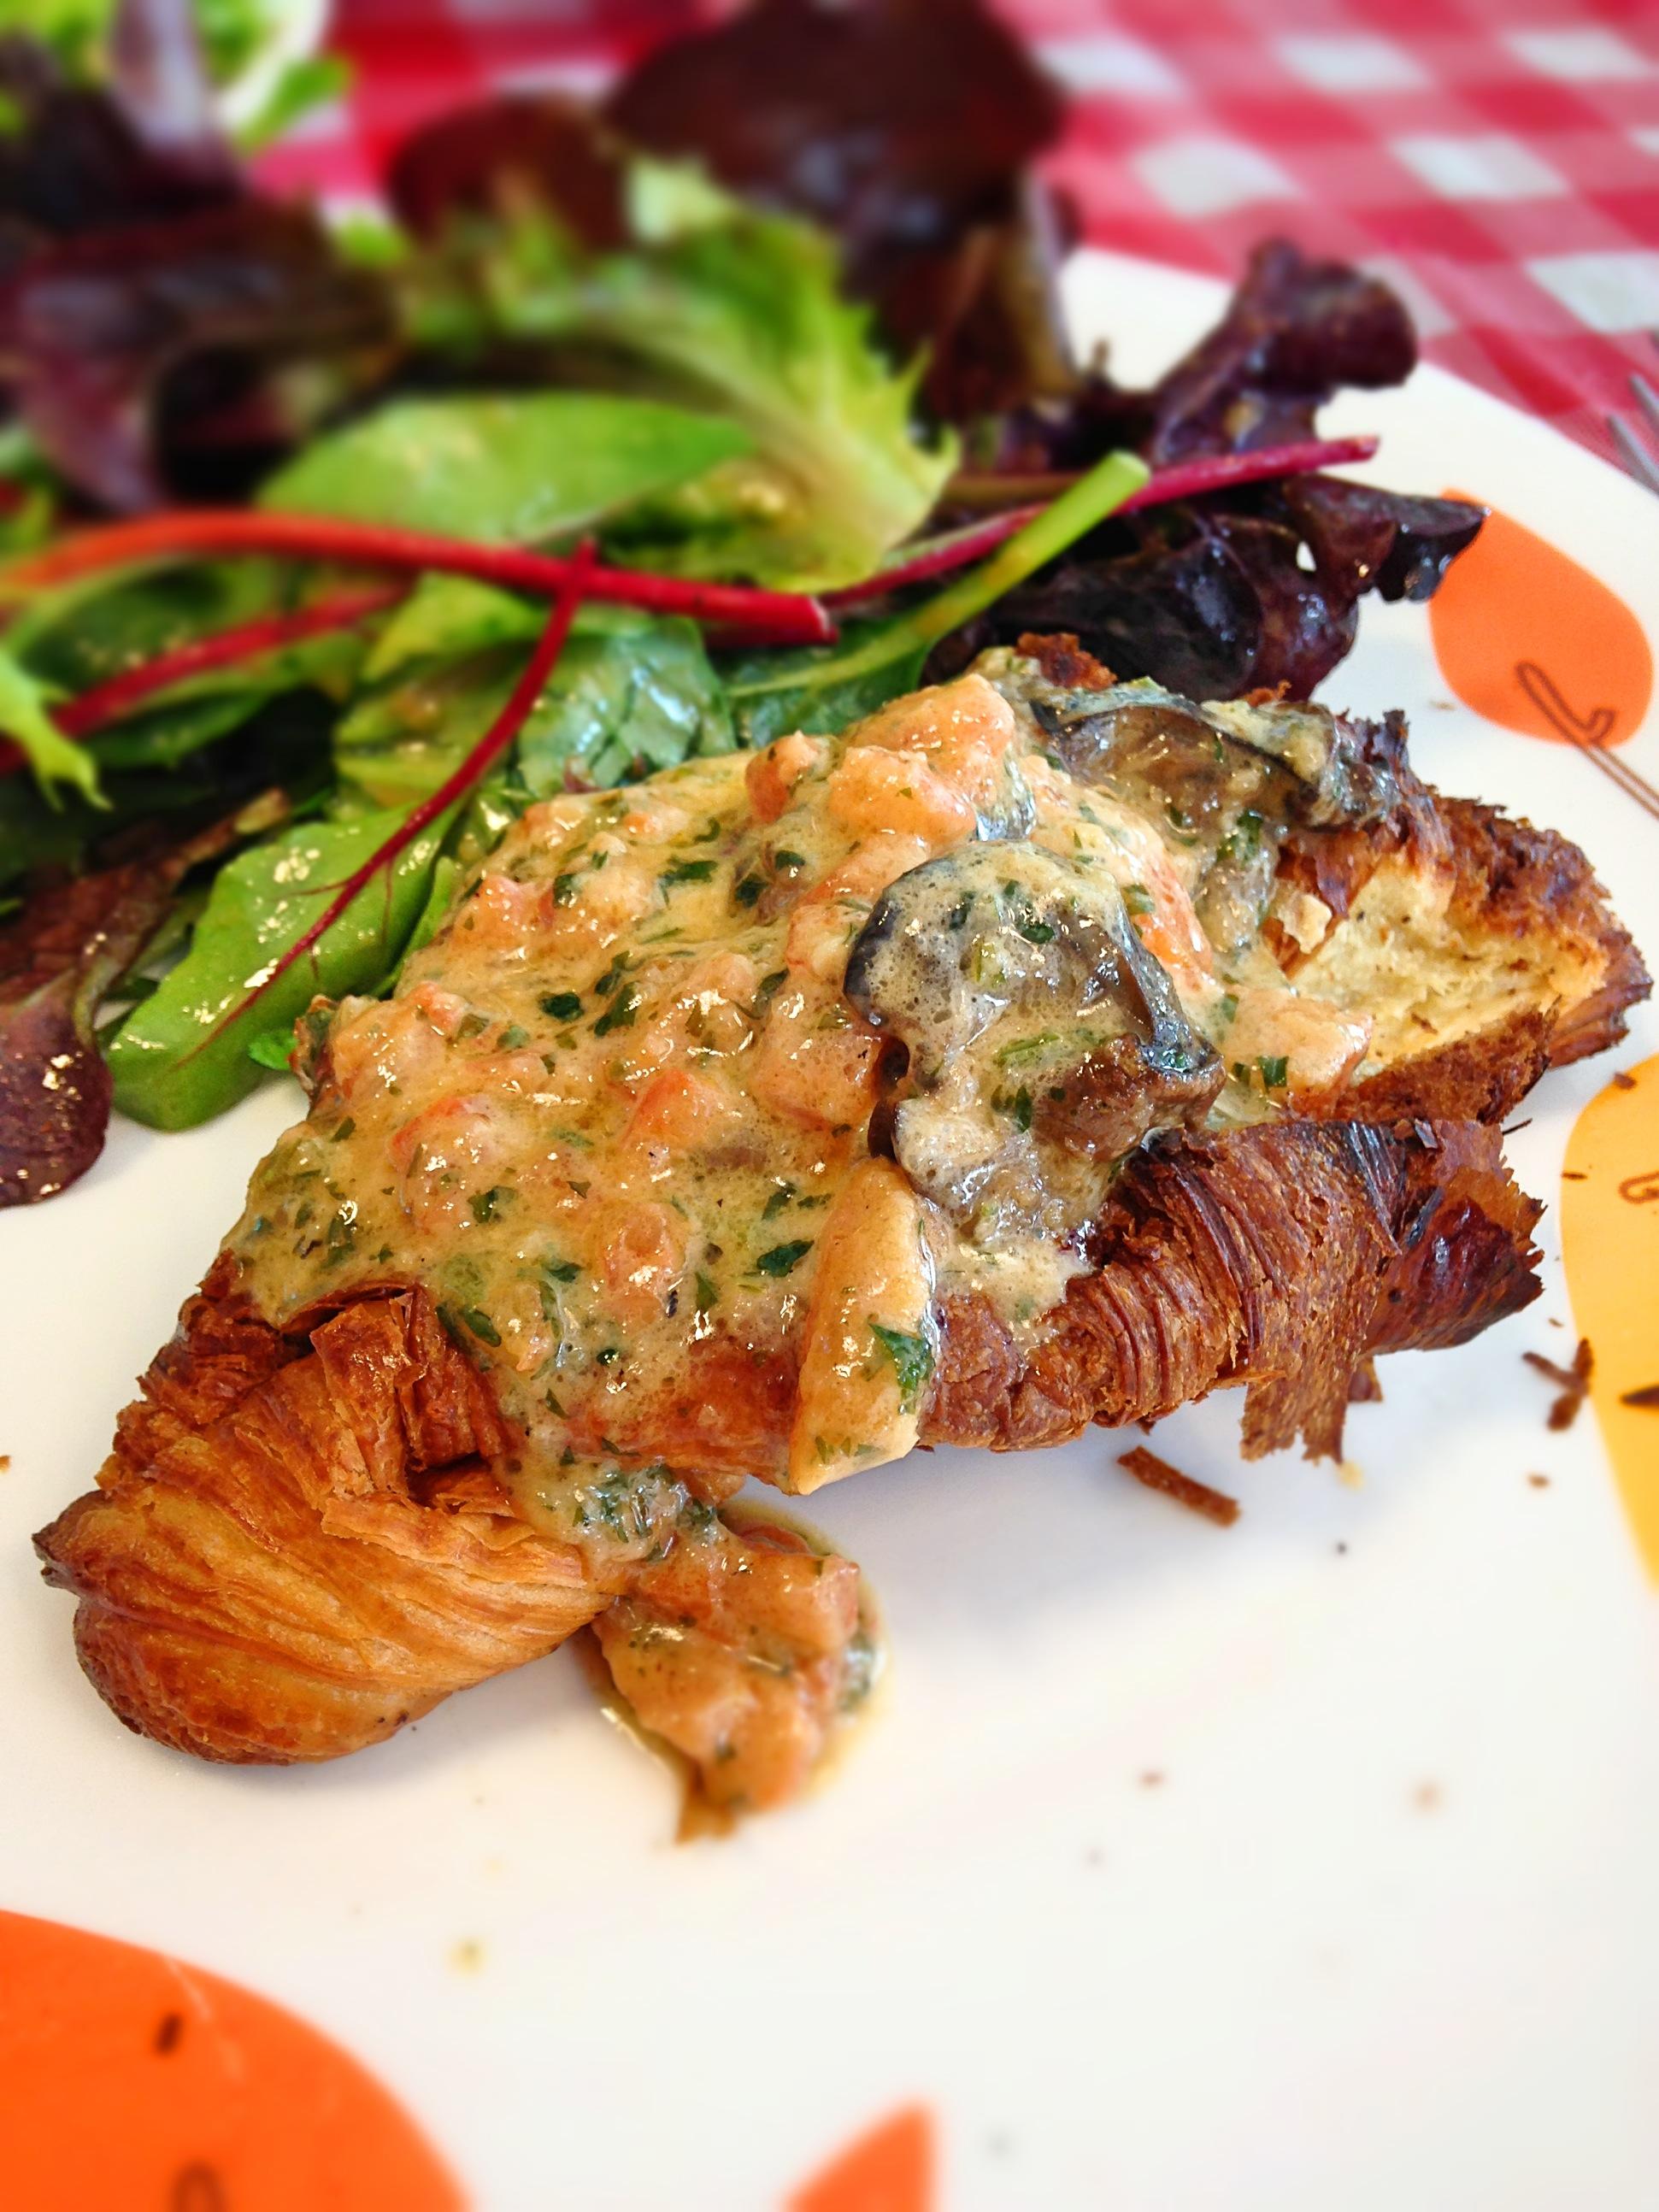 18 Most Delicious Restaurants Under 15 Dollars In Singapore